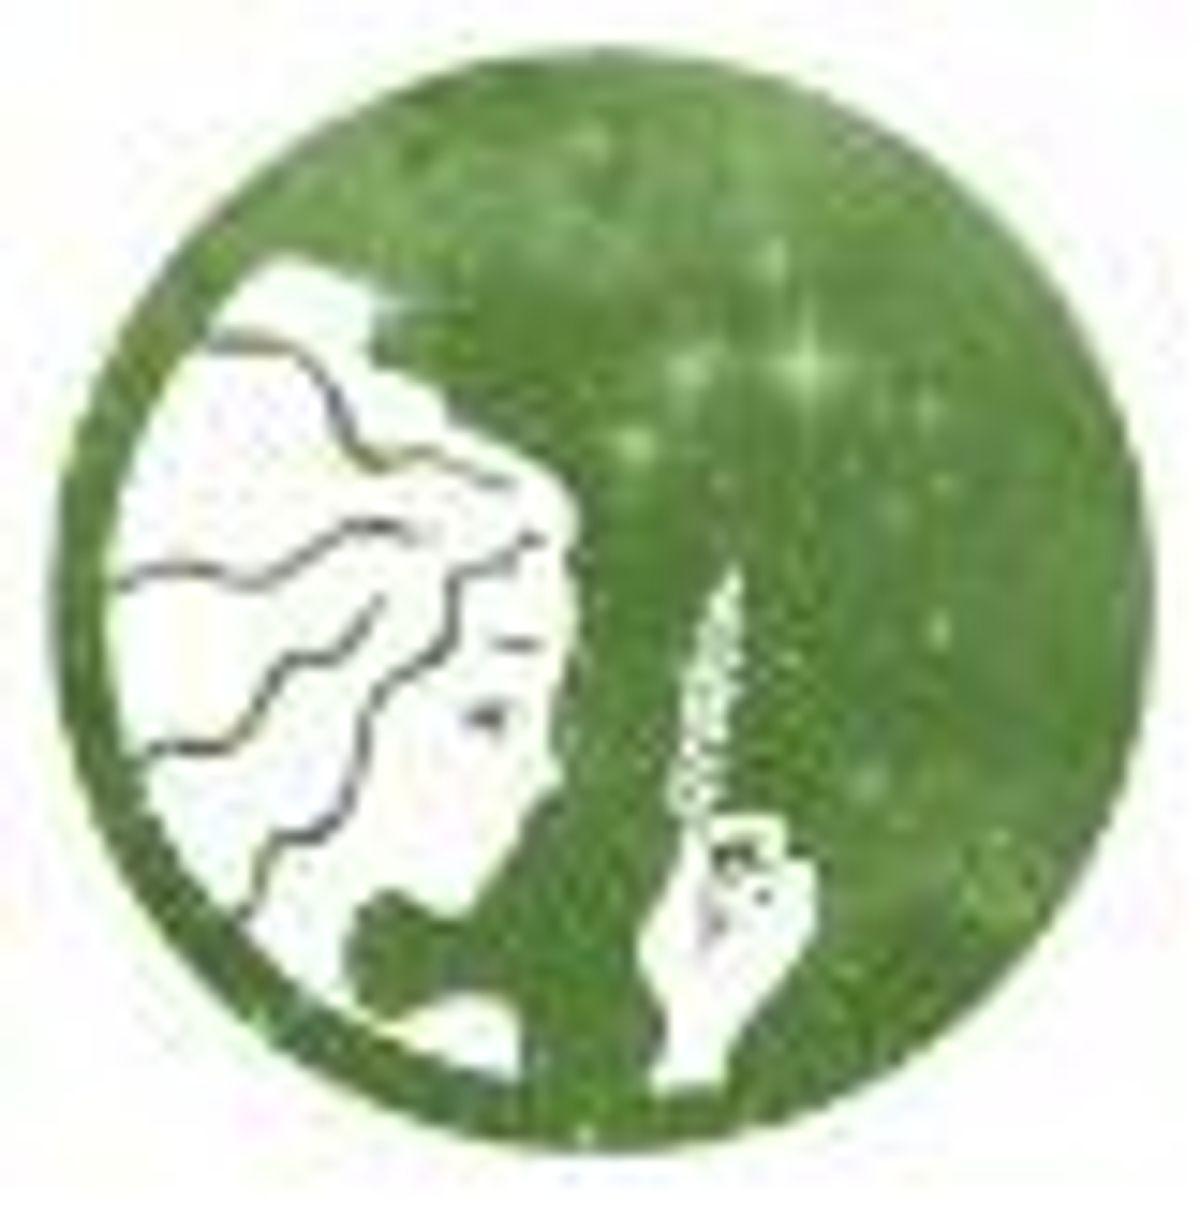 Virgo: The Mutable Earth Sign